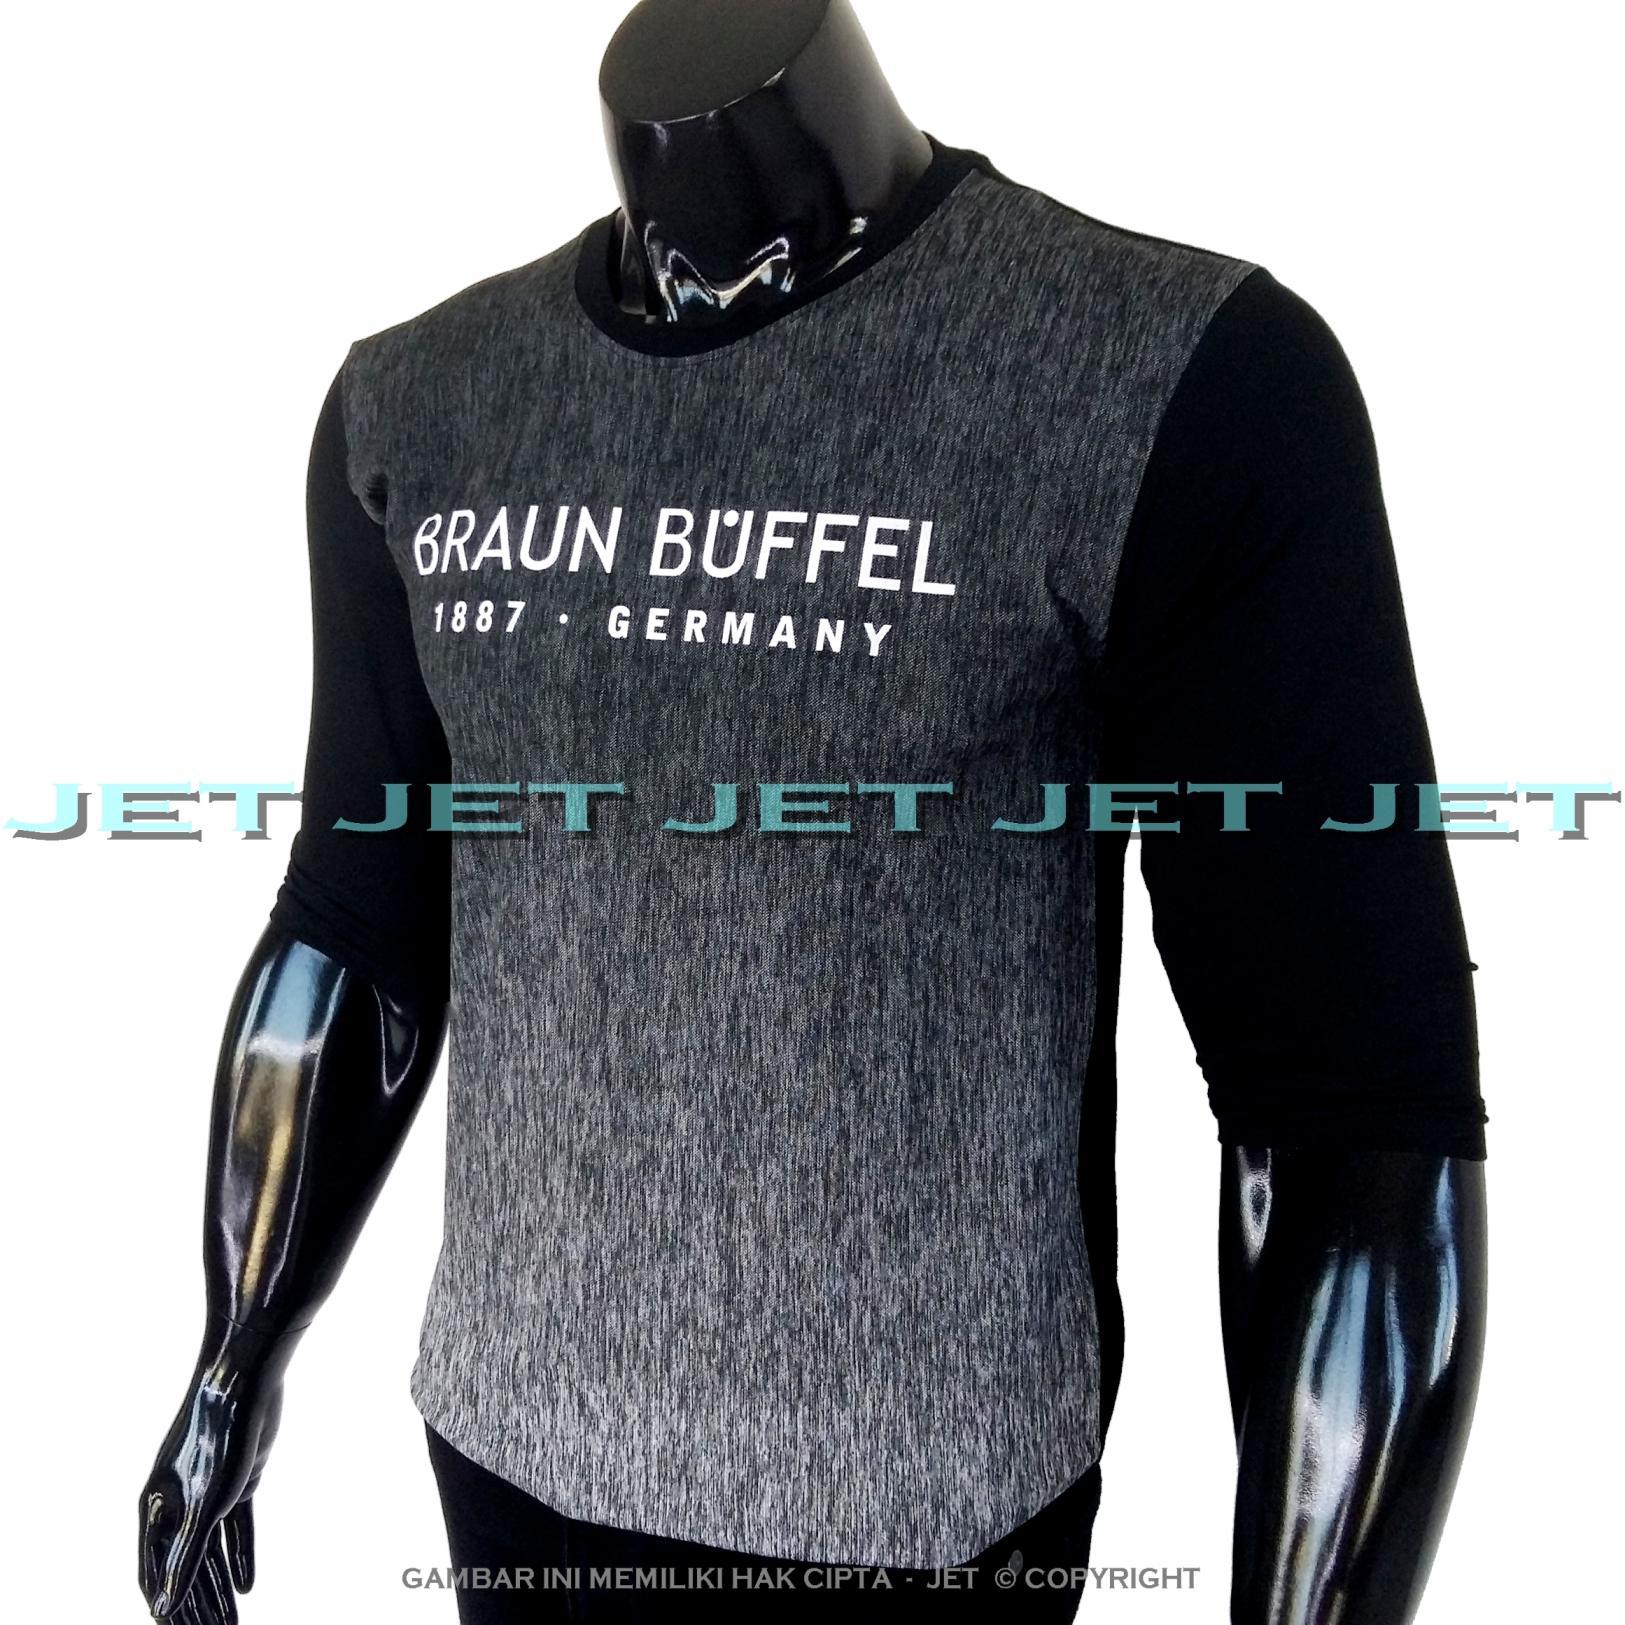 JET - Kaos Distro BRAUN BUFFEL Gradasi Lengan 3/4 Panjang Soft Rayon Viscose Blended Lycra Size M Fit To L Pria / Wanita Garis Salur Motif Visual Art